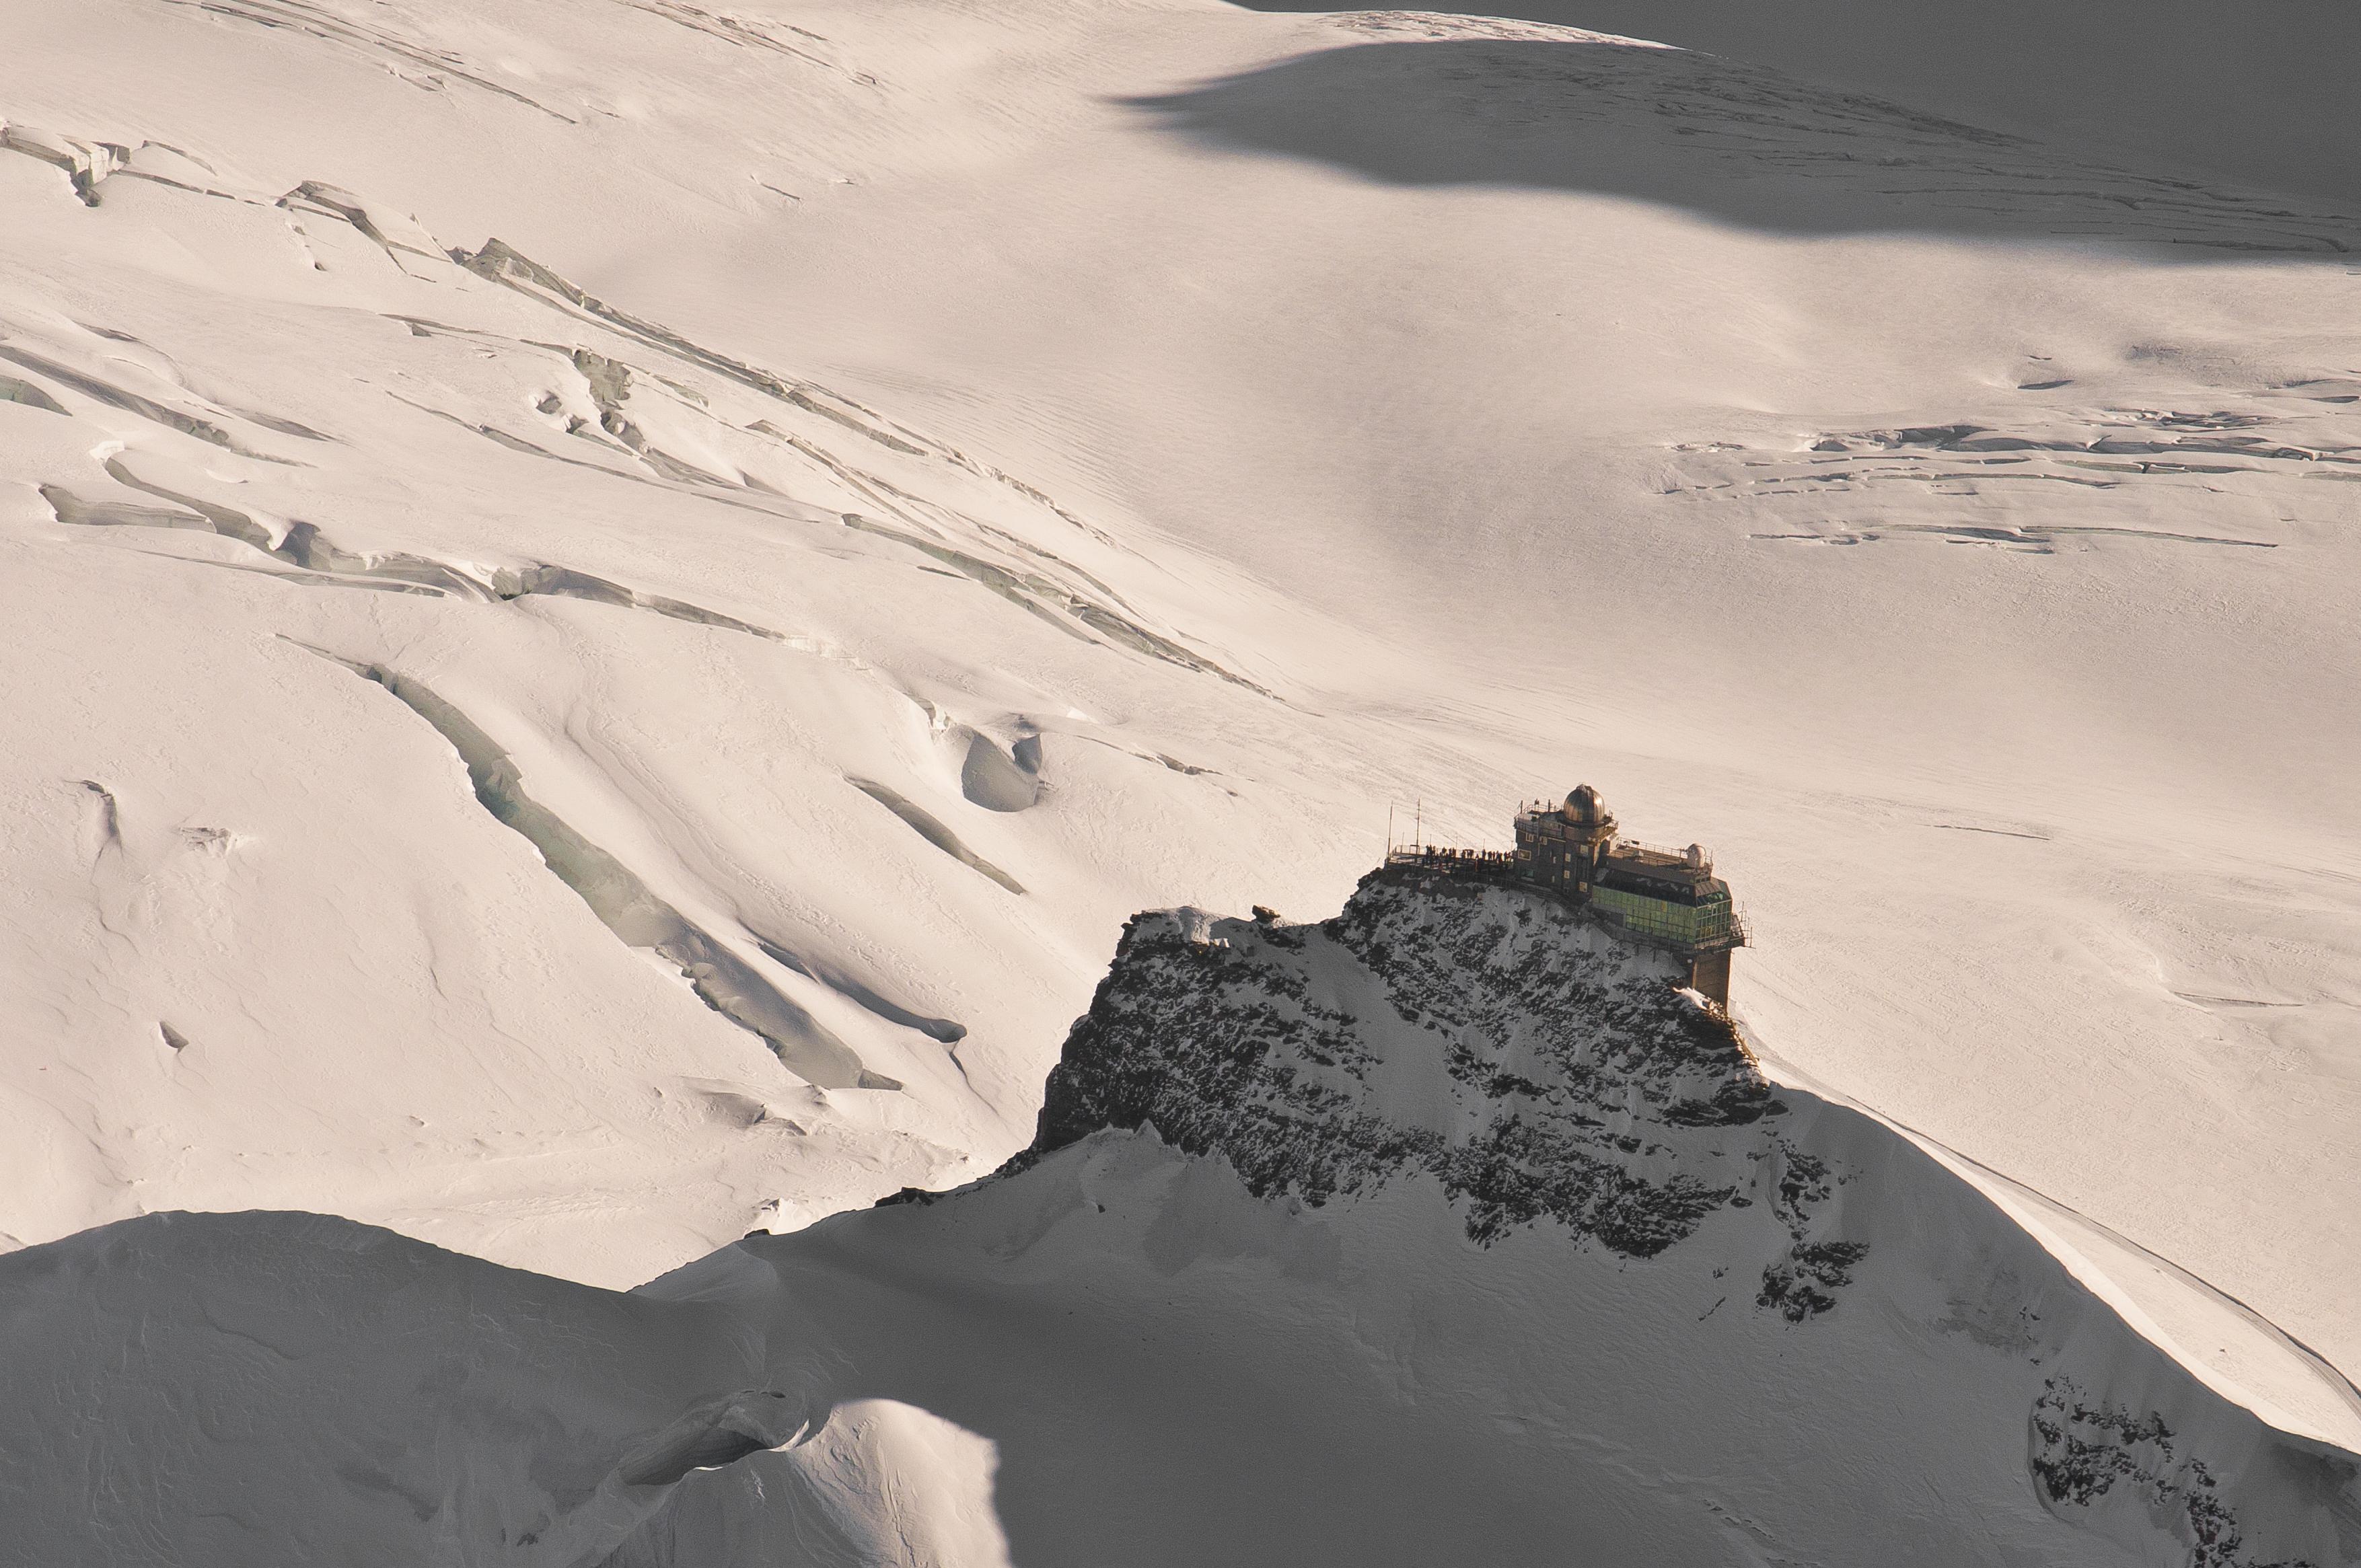 Jungfrau Joch